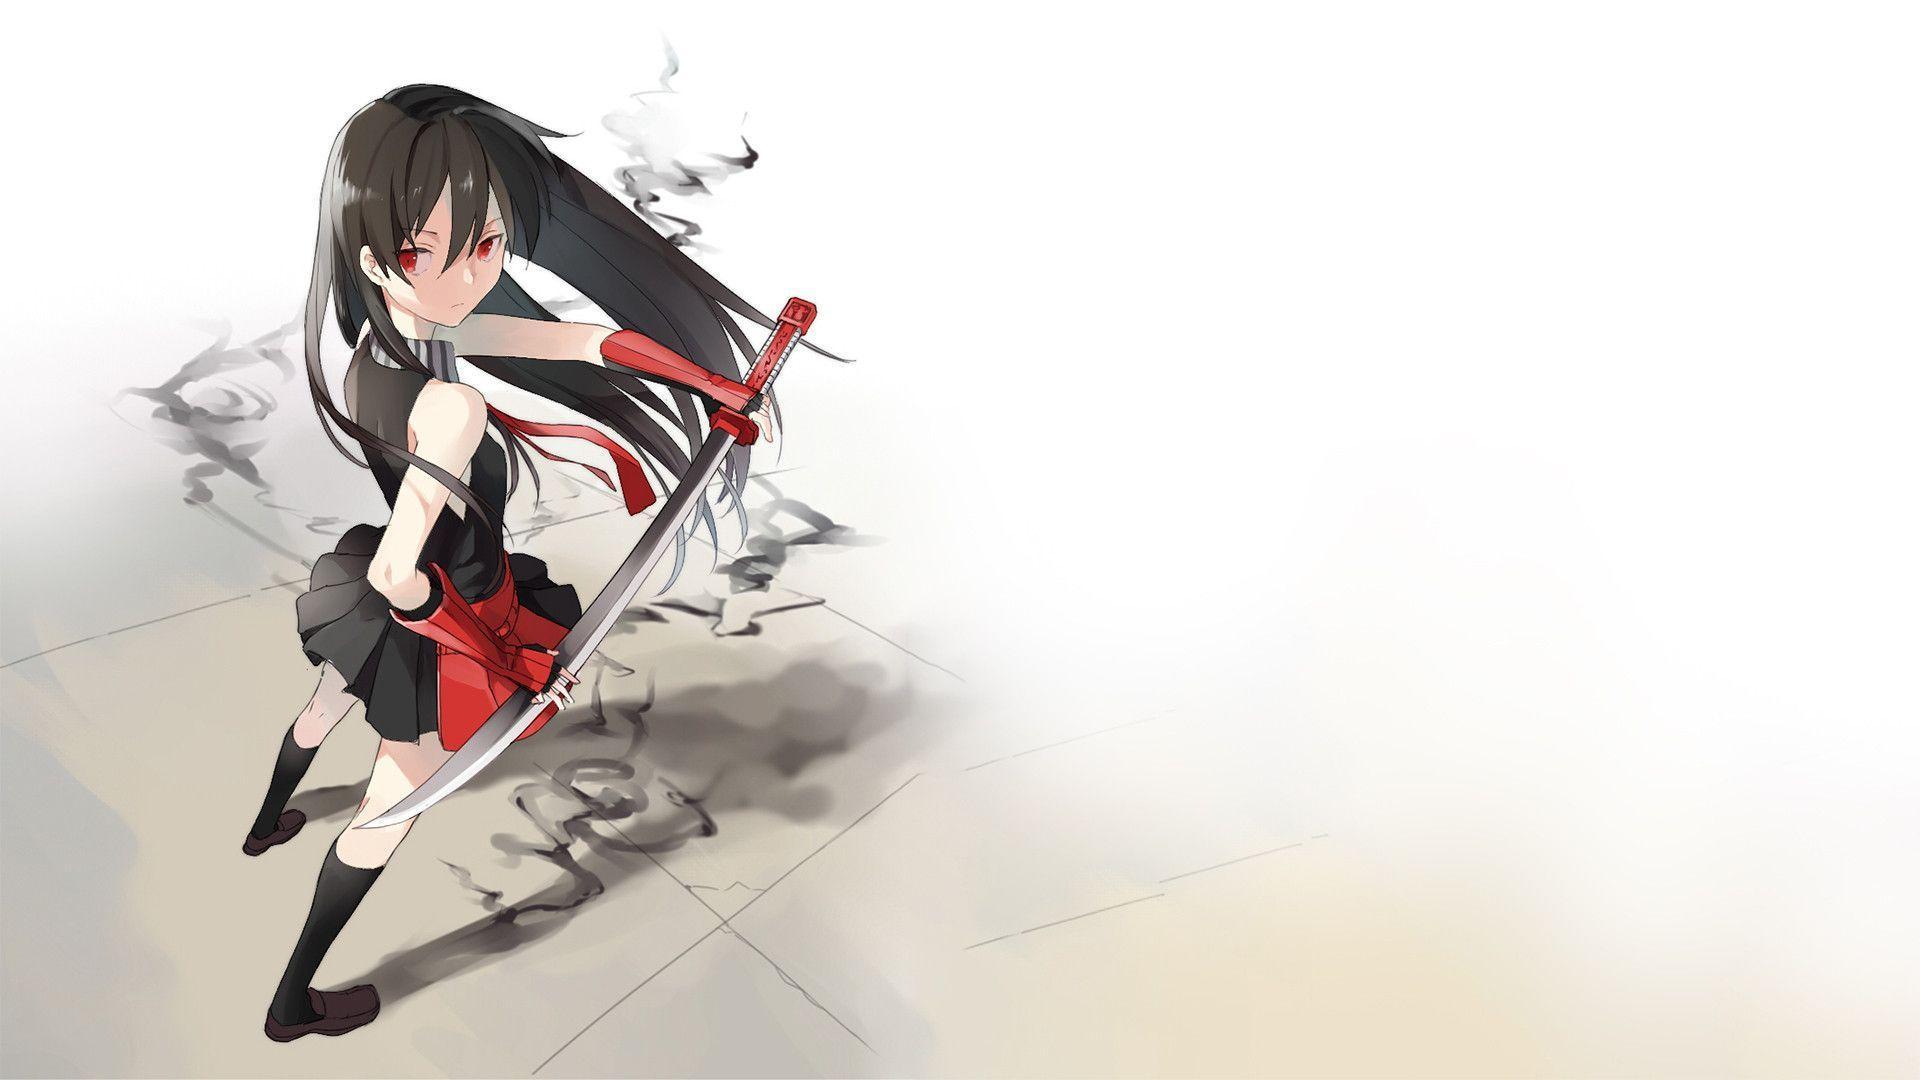 Cute Baby Angel Wallpaper Hd Akame Holding Her Red Sword Akame Ga Kill Wallpaper